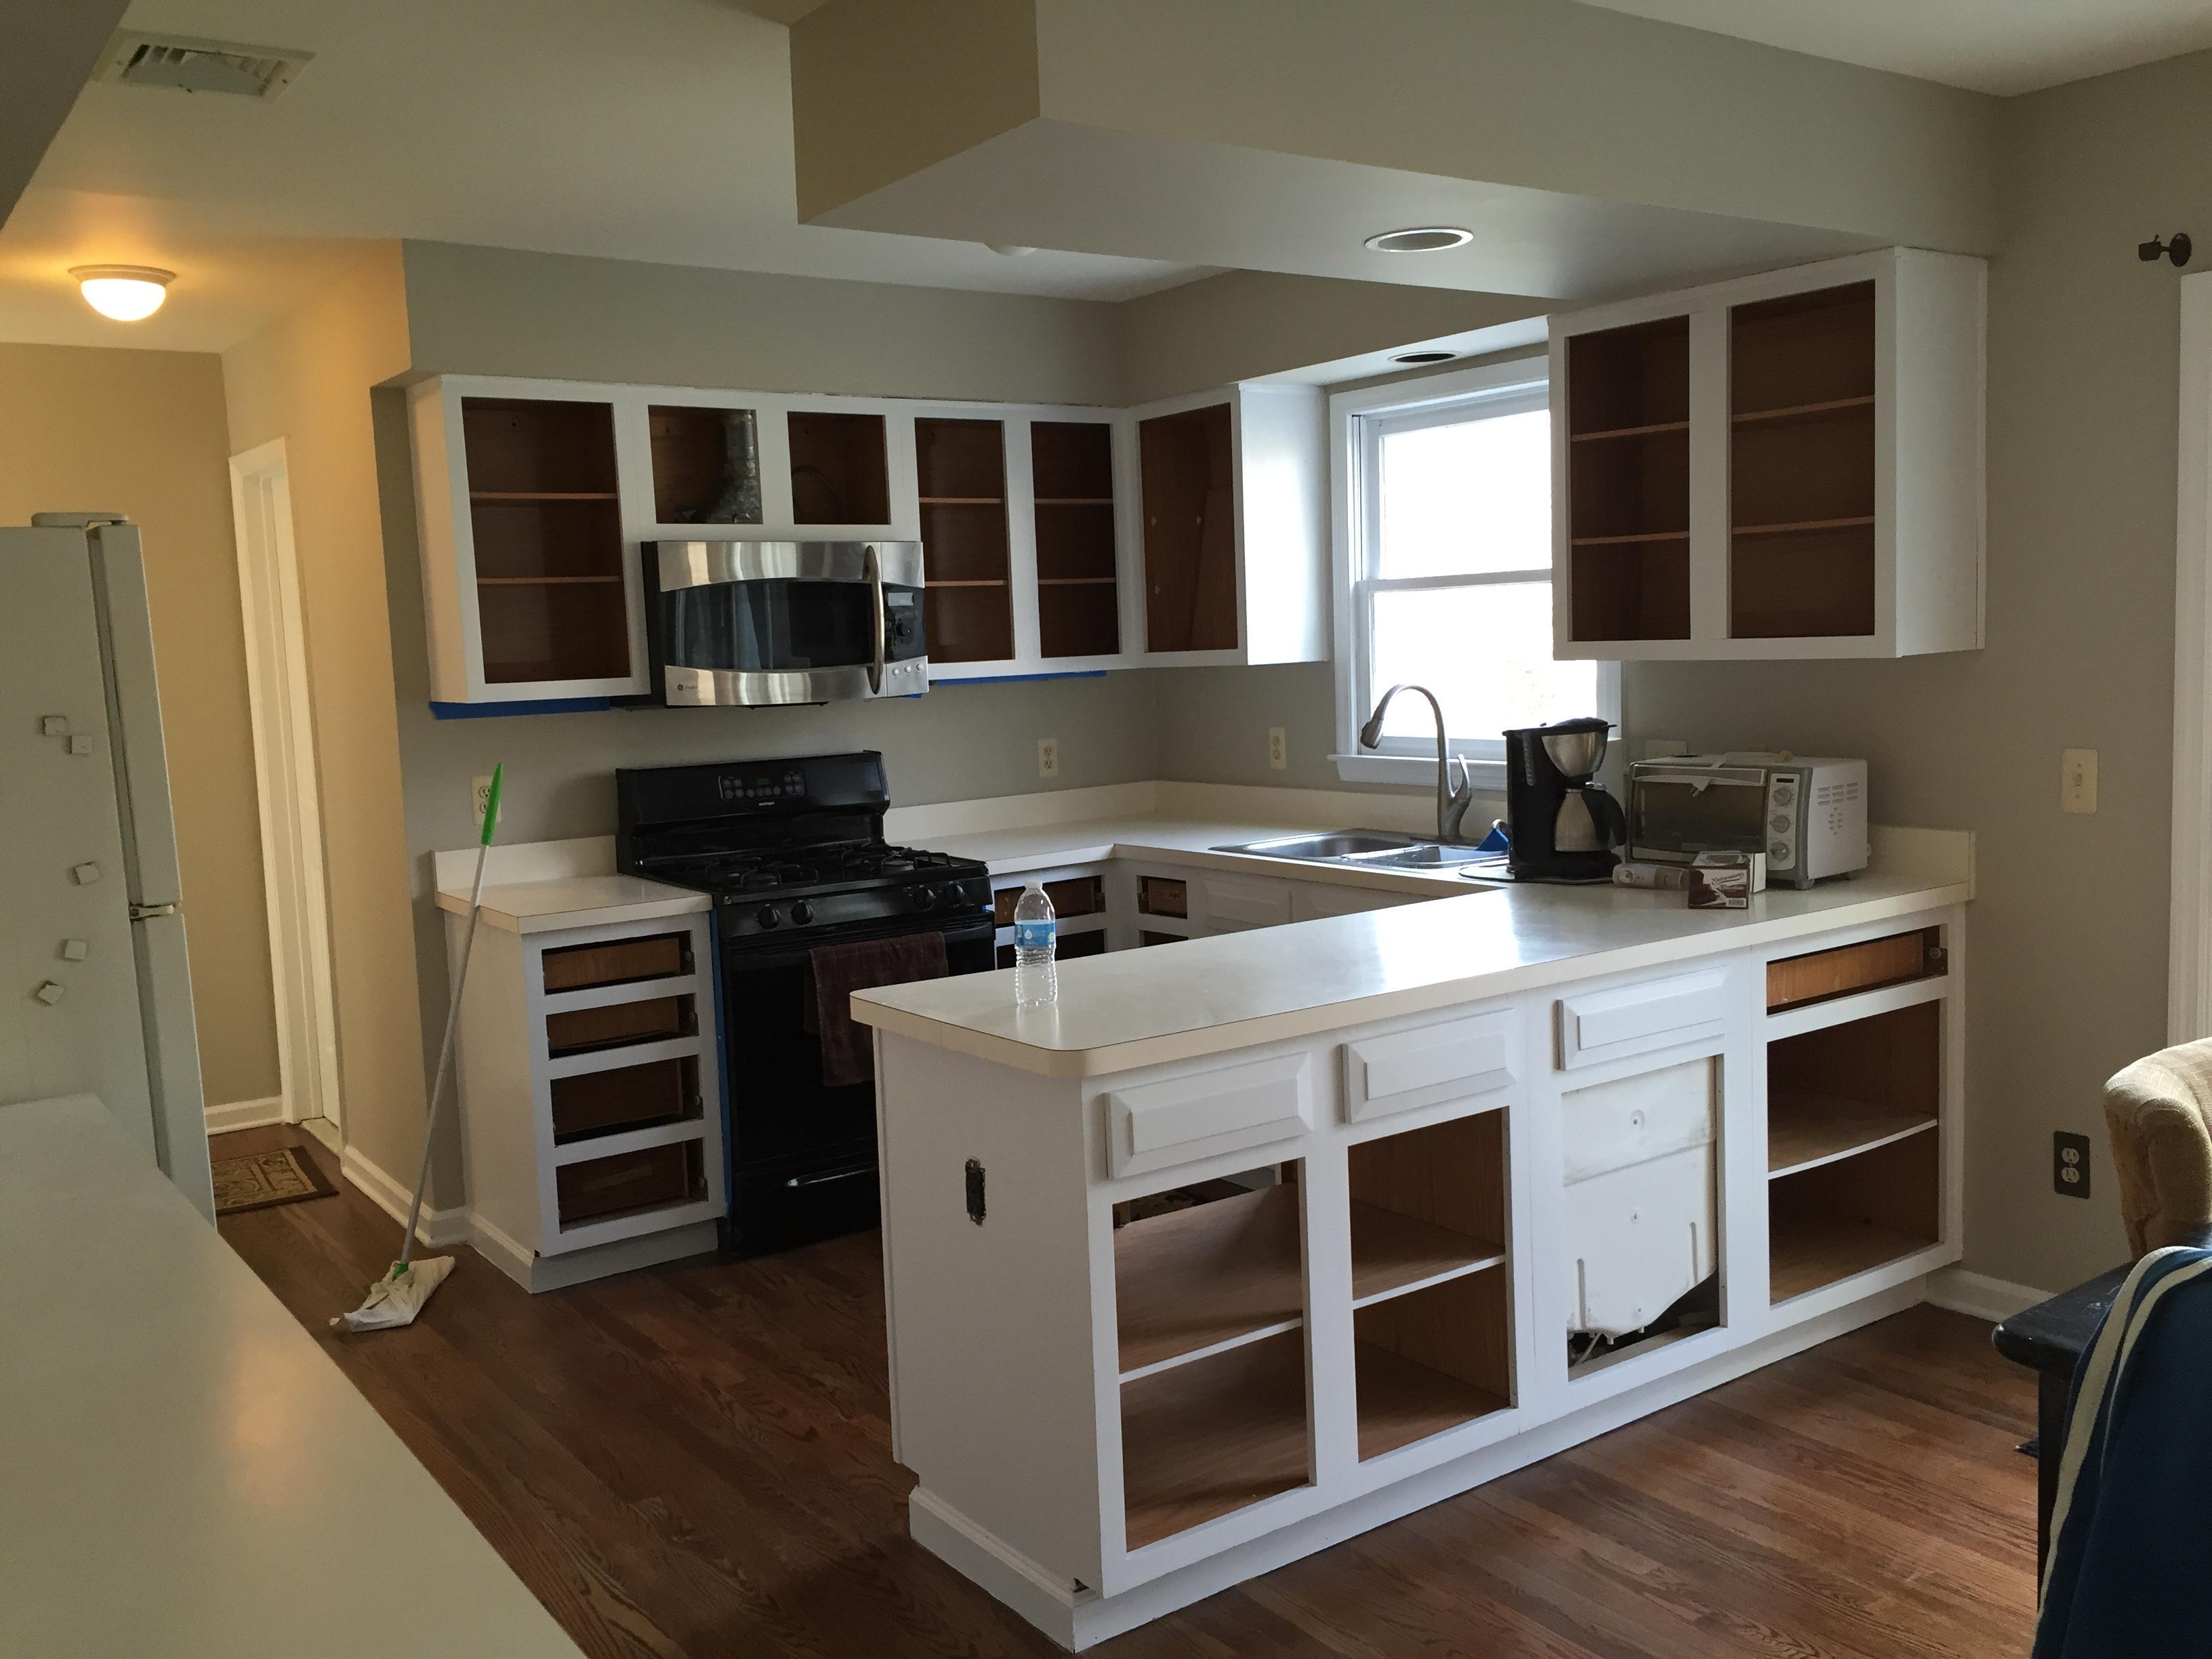 Ruamal Painting And Home Maintenance LLC image 14